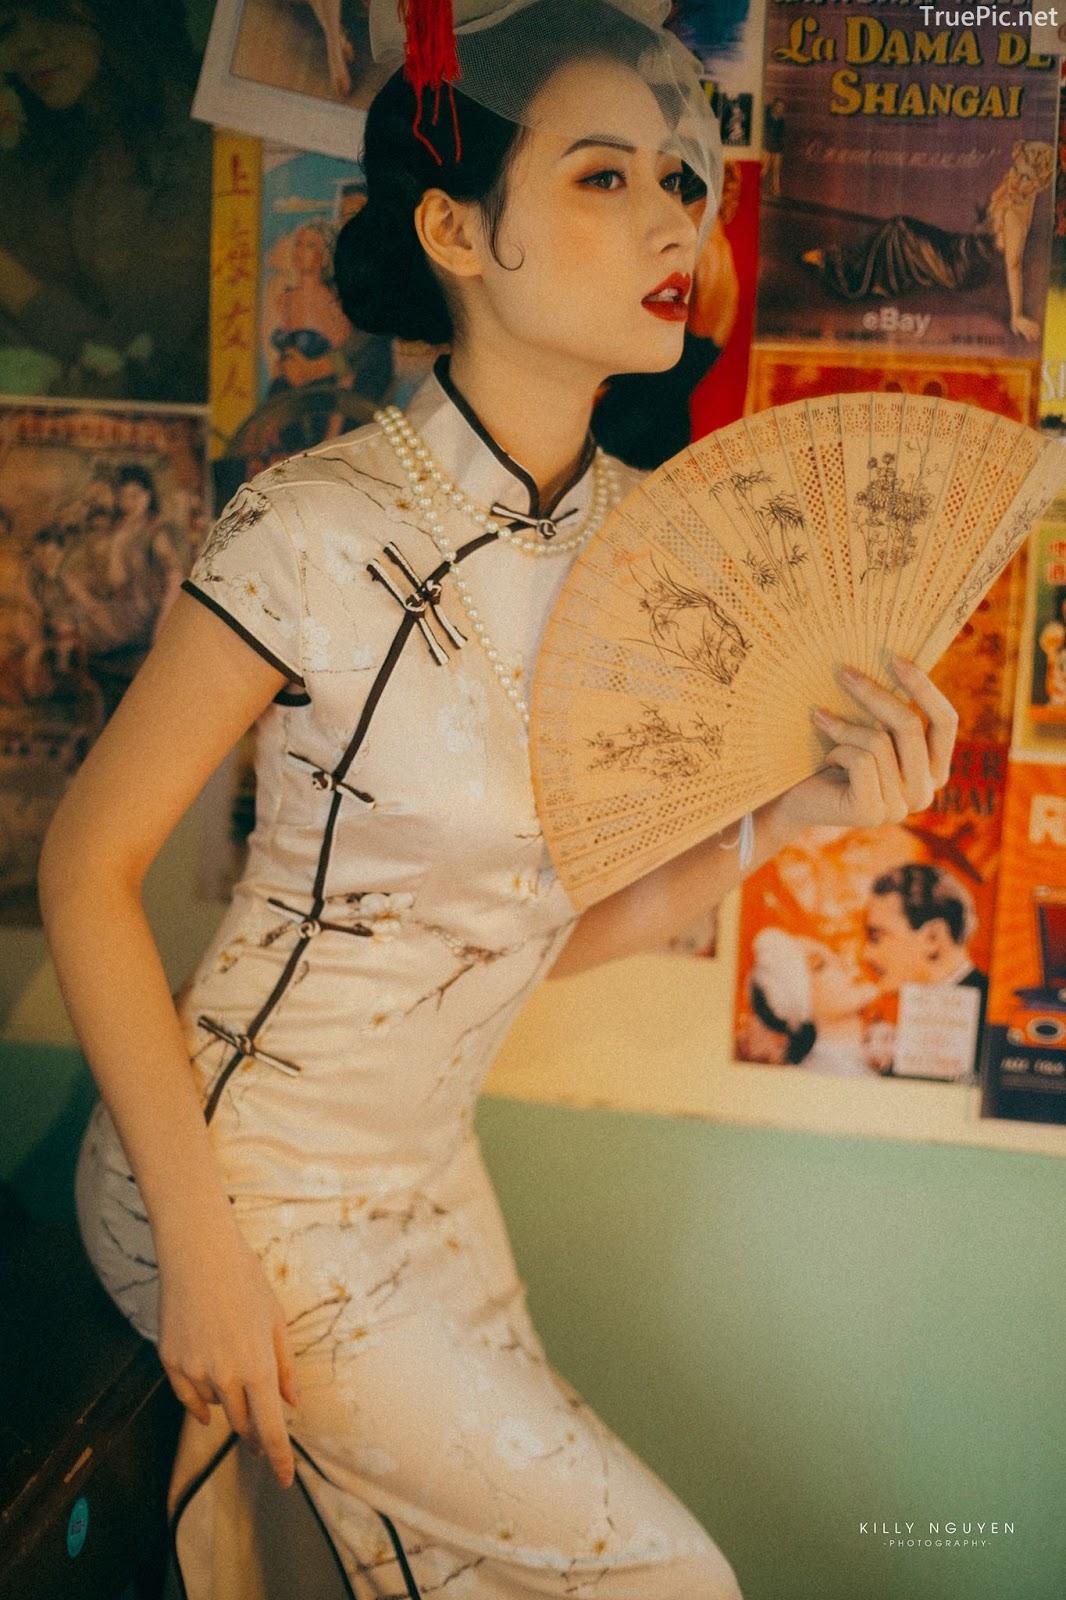 Vietnamese model Lan Huong - Lost in ShangHai - Photo by Killy Nguyen - TruePic.net - Picture 3